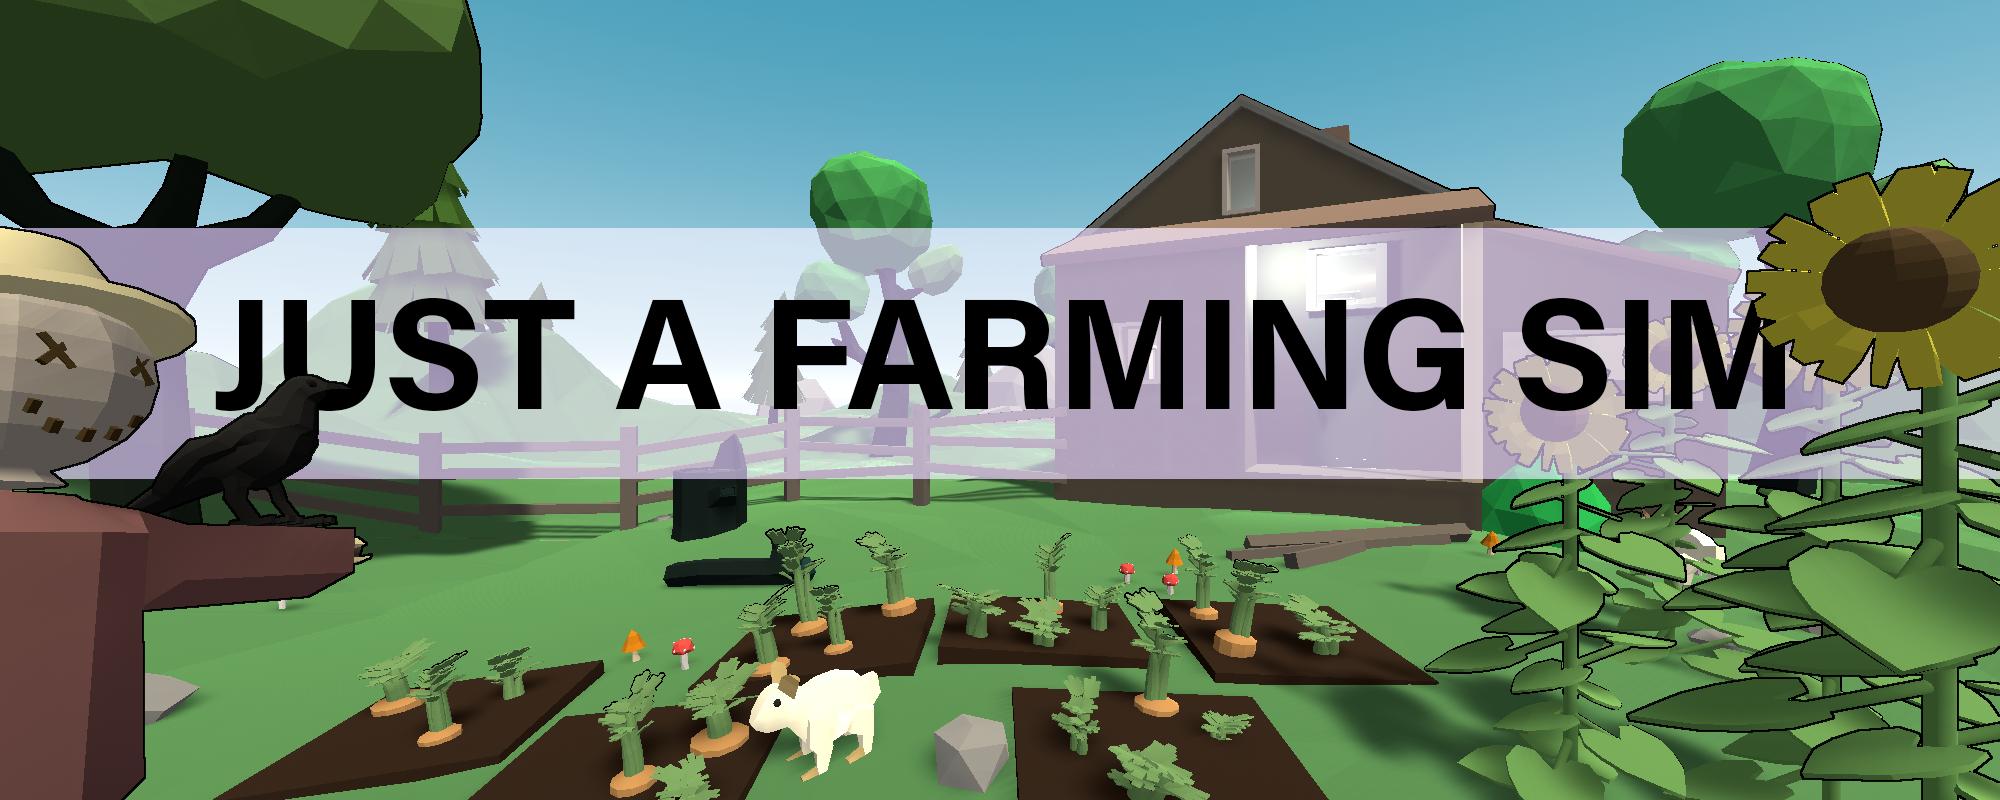 Just a Farming Sim